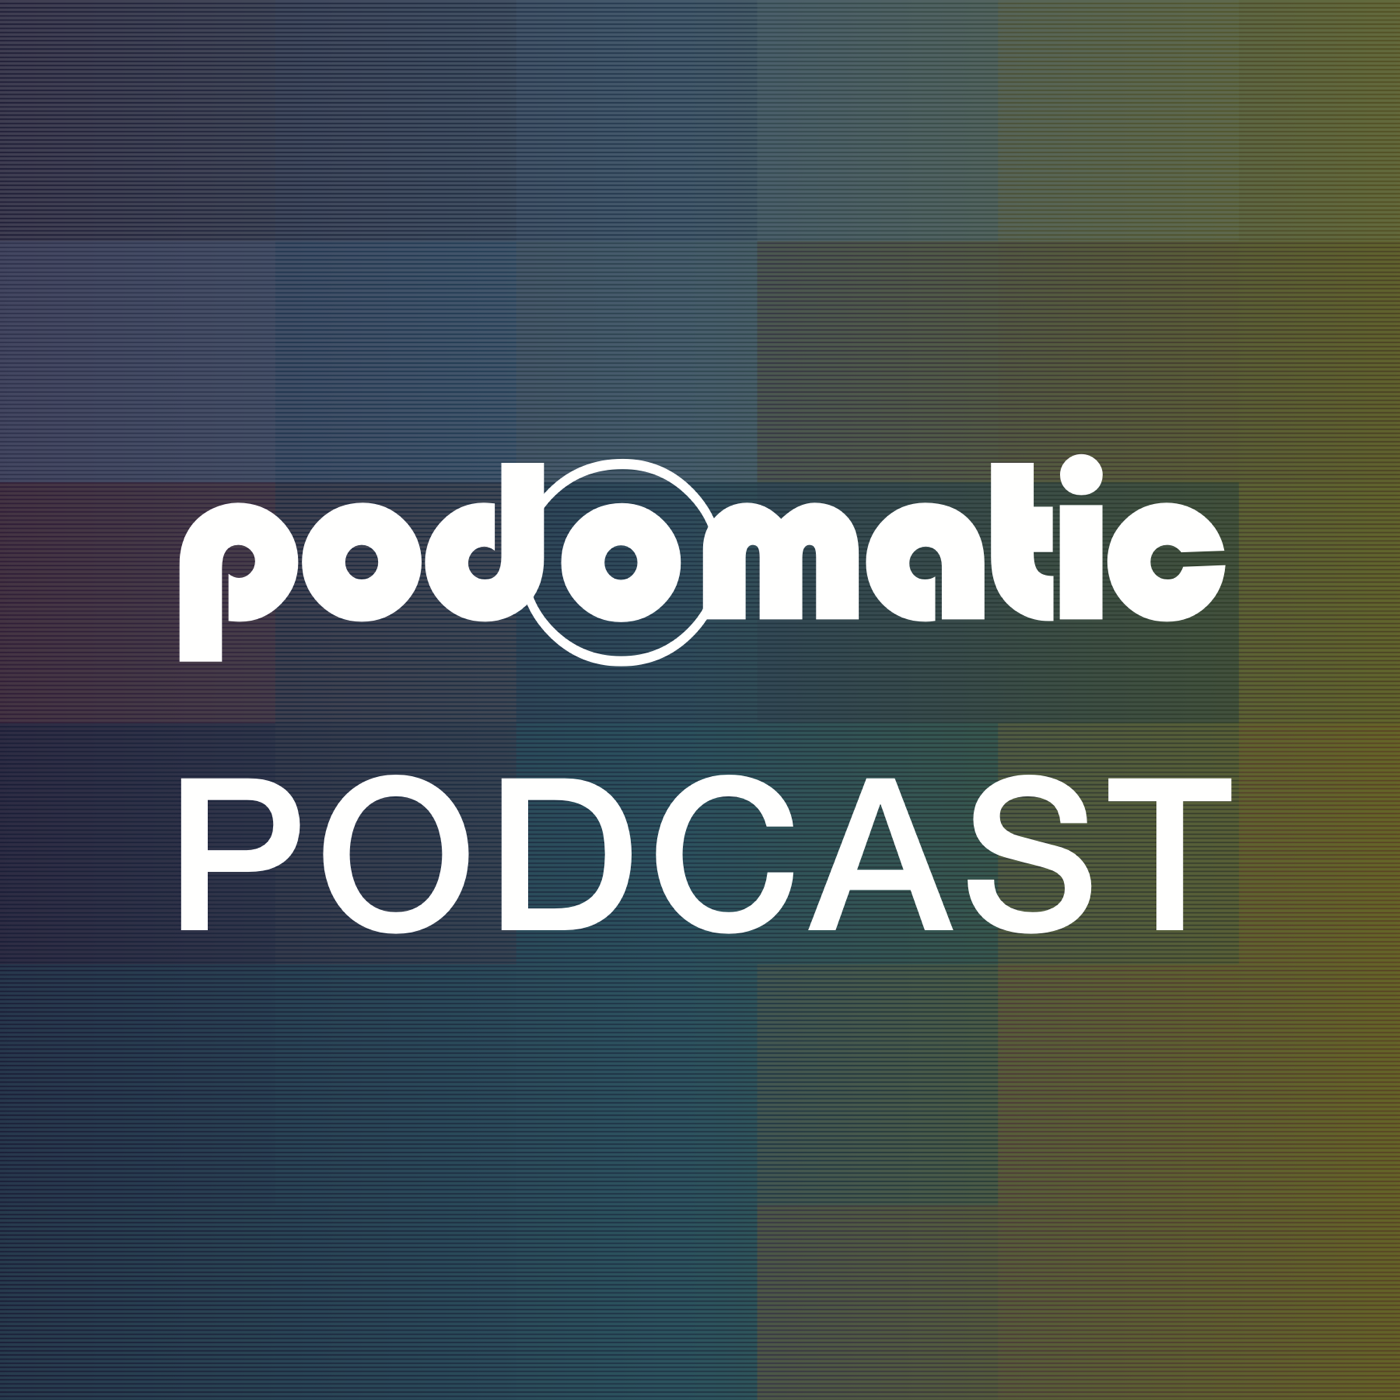 thomas edmunds Podcast